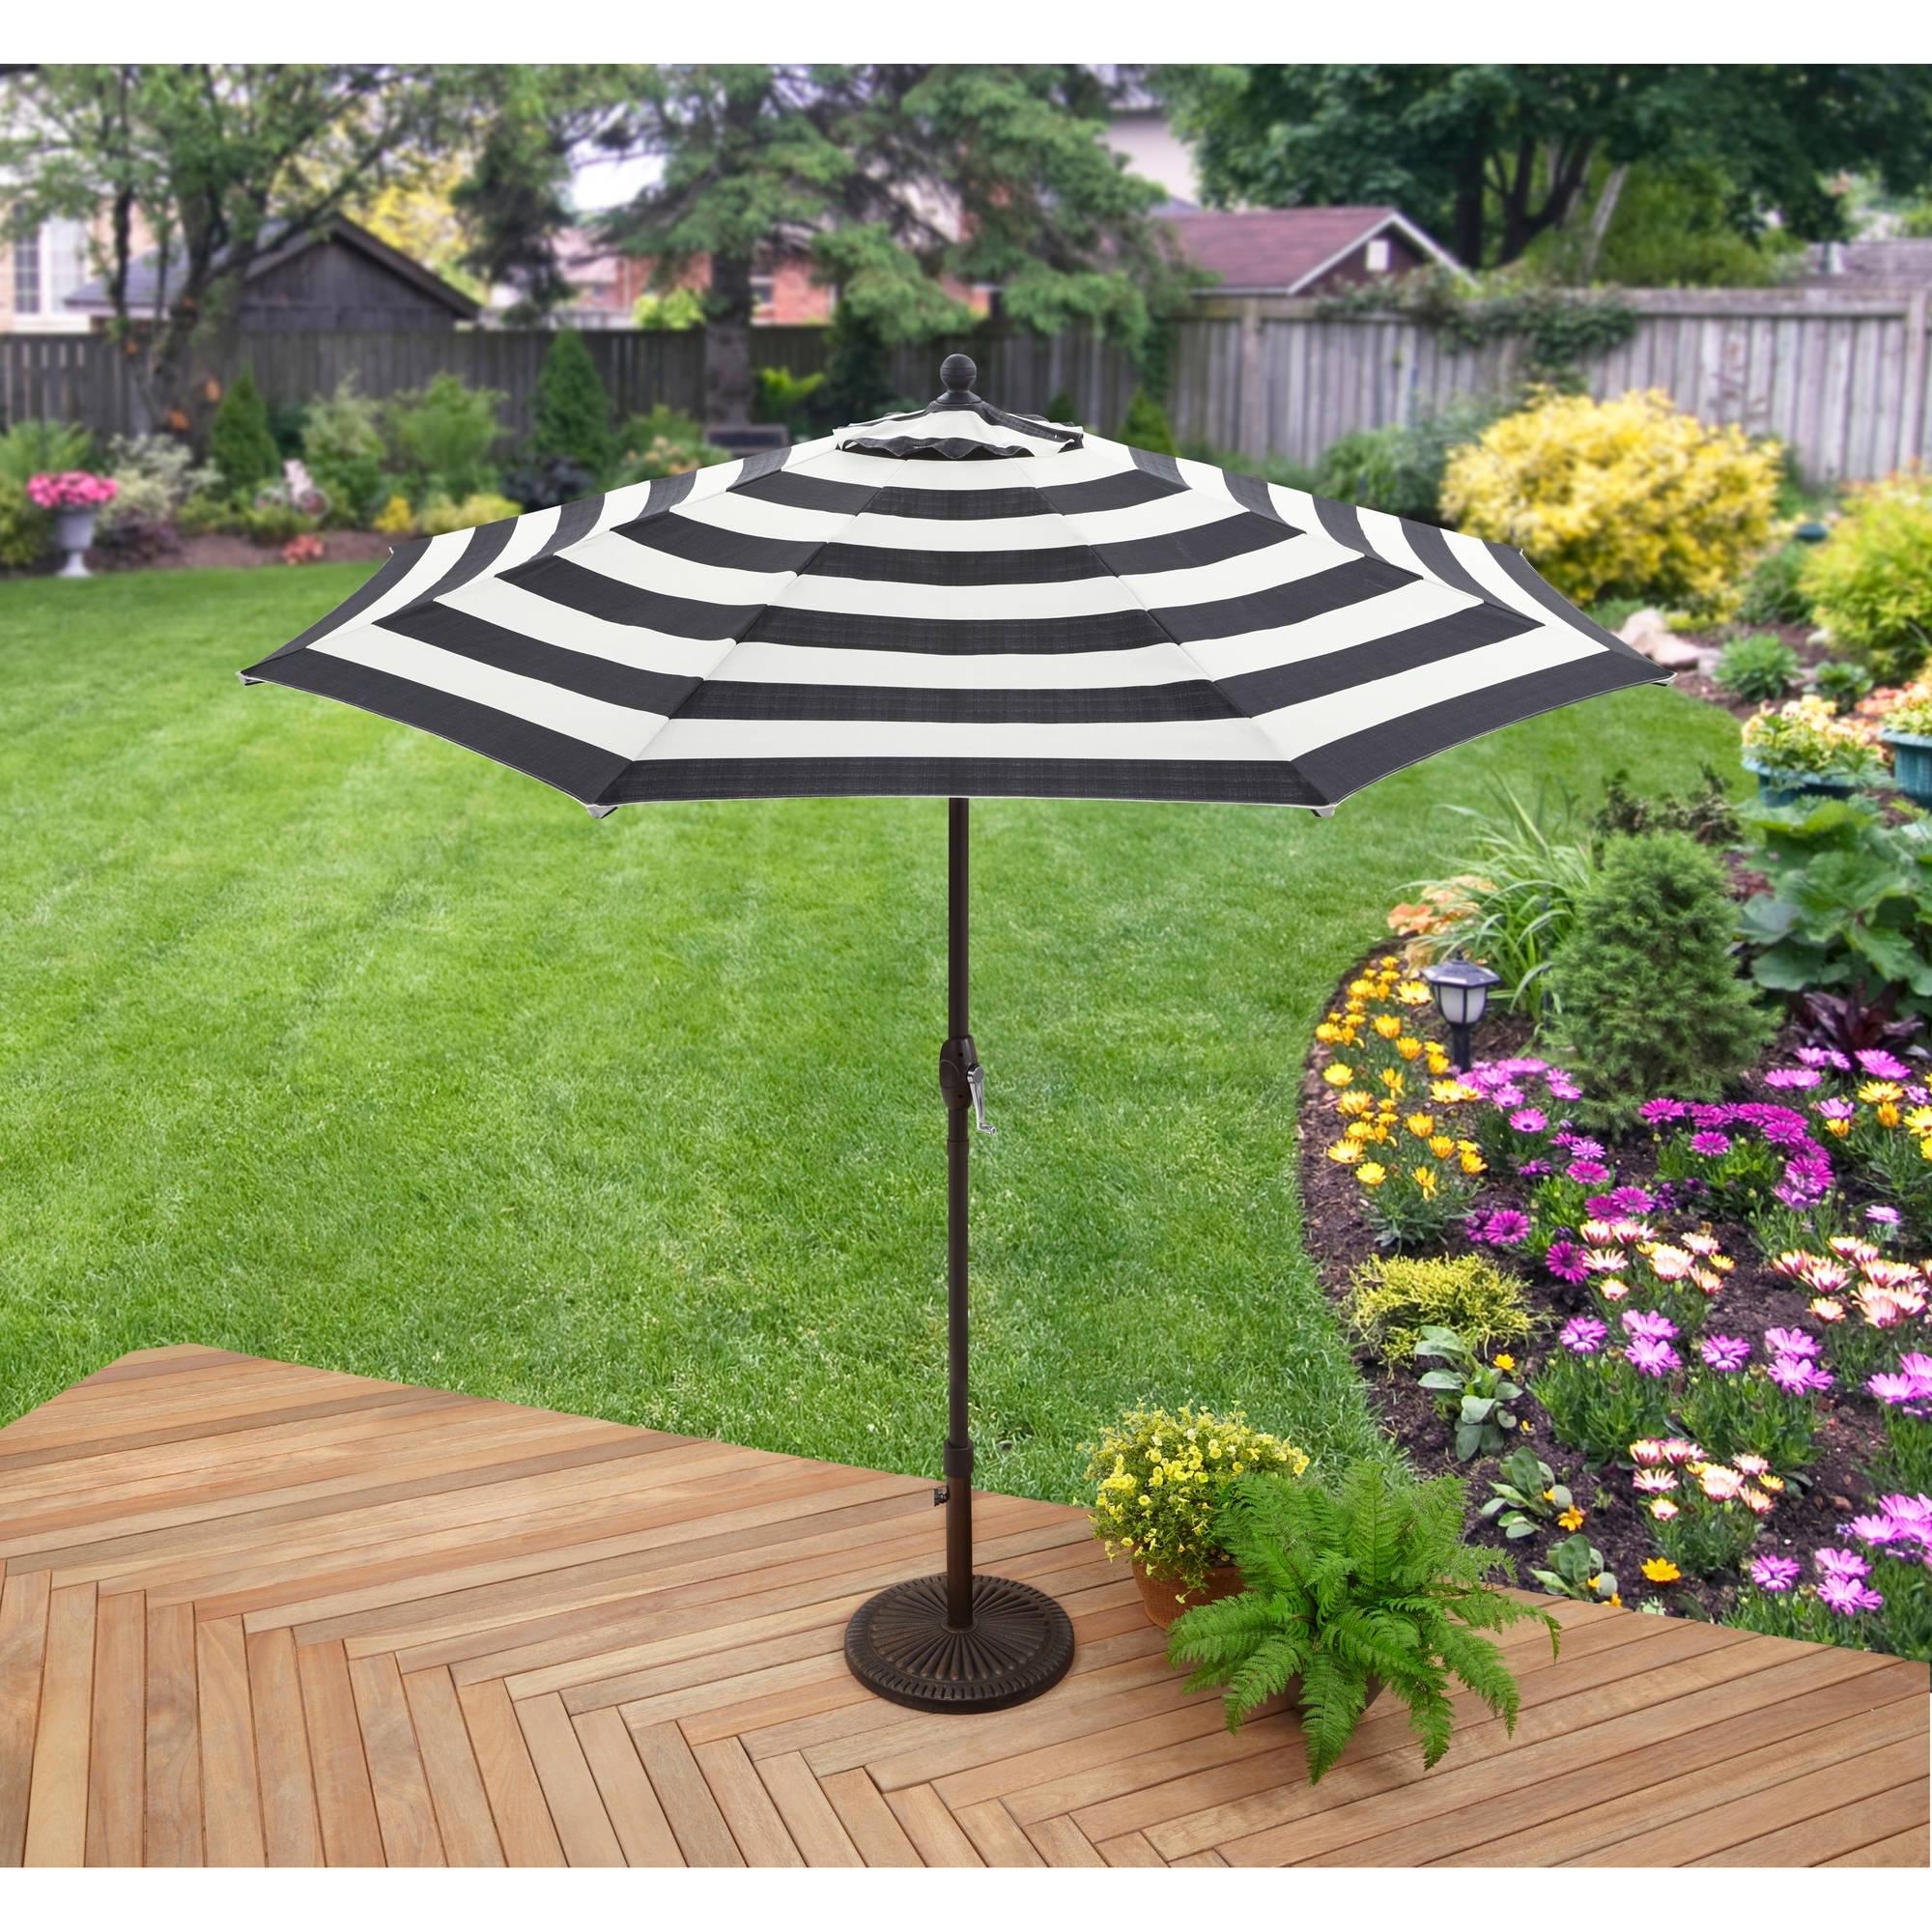 Best And Newest Sunbrella Patio Umbrellas At Walmart In Better Homes And Gardens 9' Market Umbrella, Cabana Stripe – Walmart (View 6 of 20)